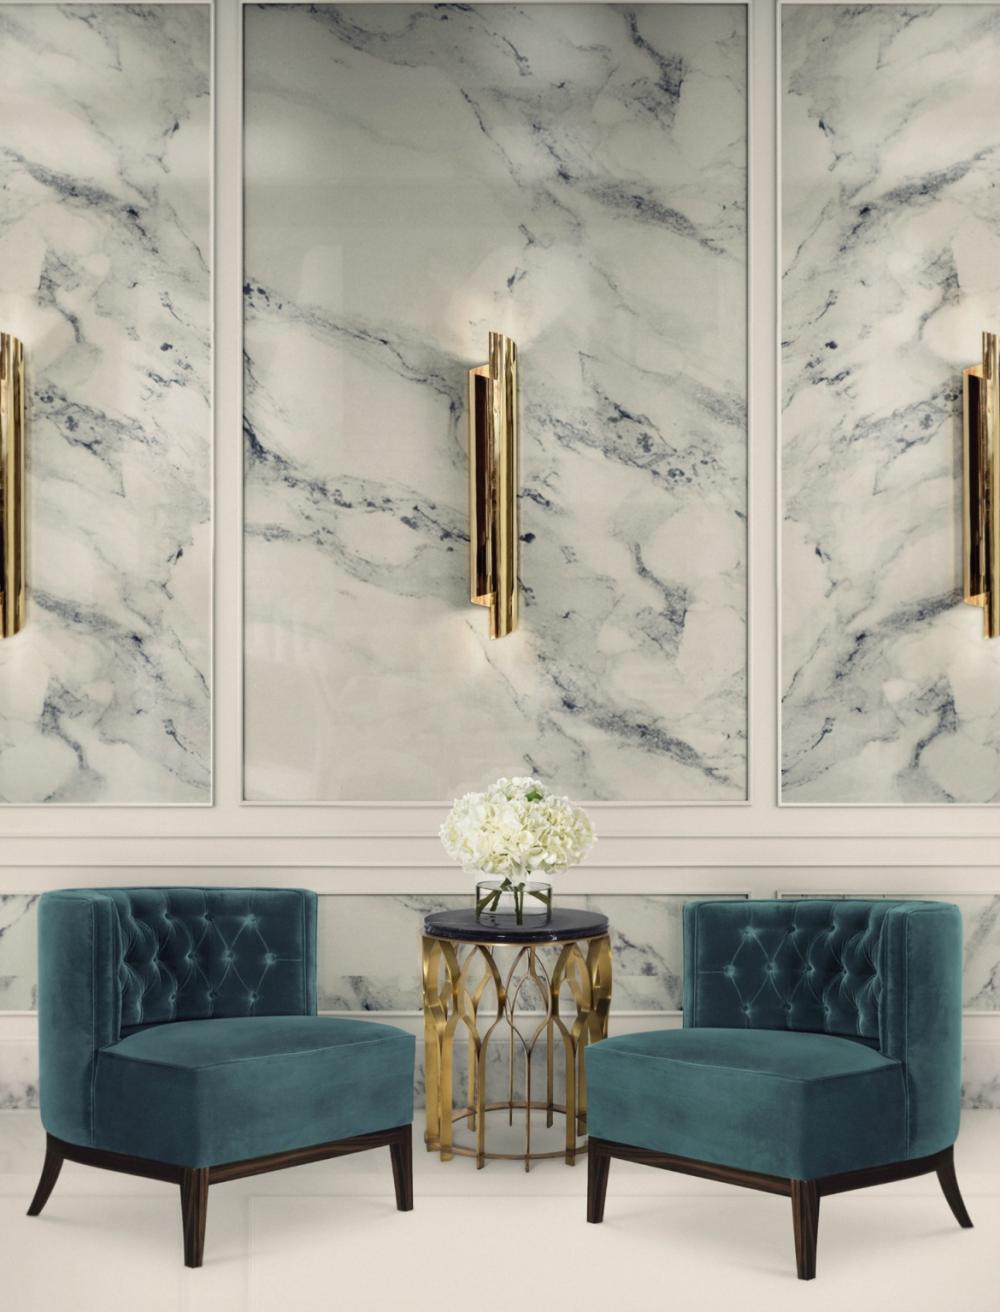 modern classic interior modern classic interior Modern Classic Interior| Interior Design Inspiration Modern Classic Interior 6